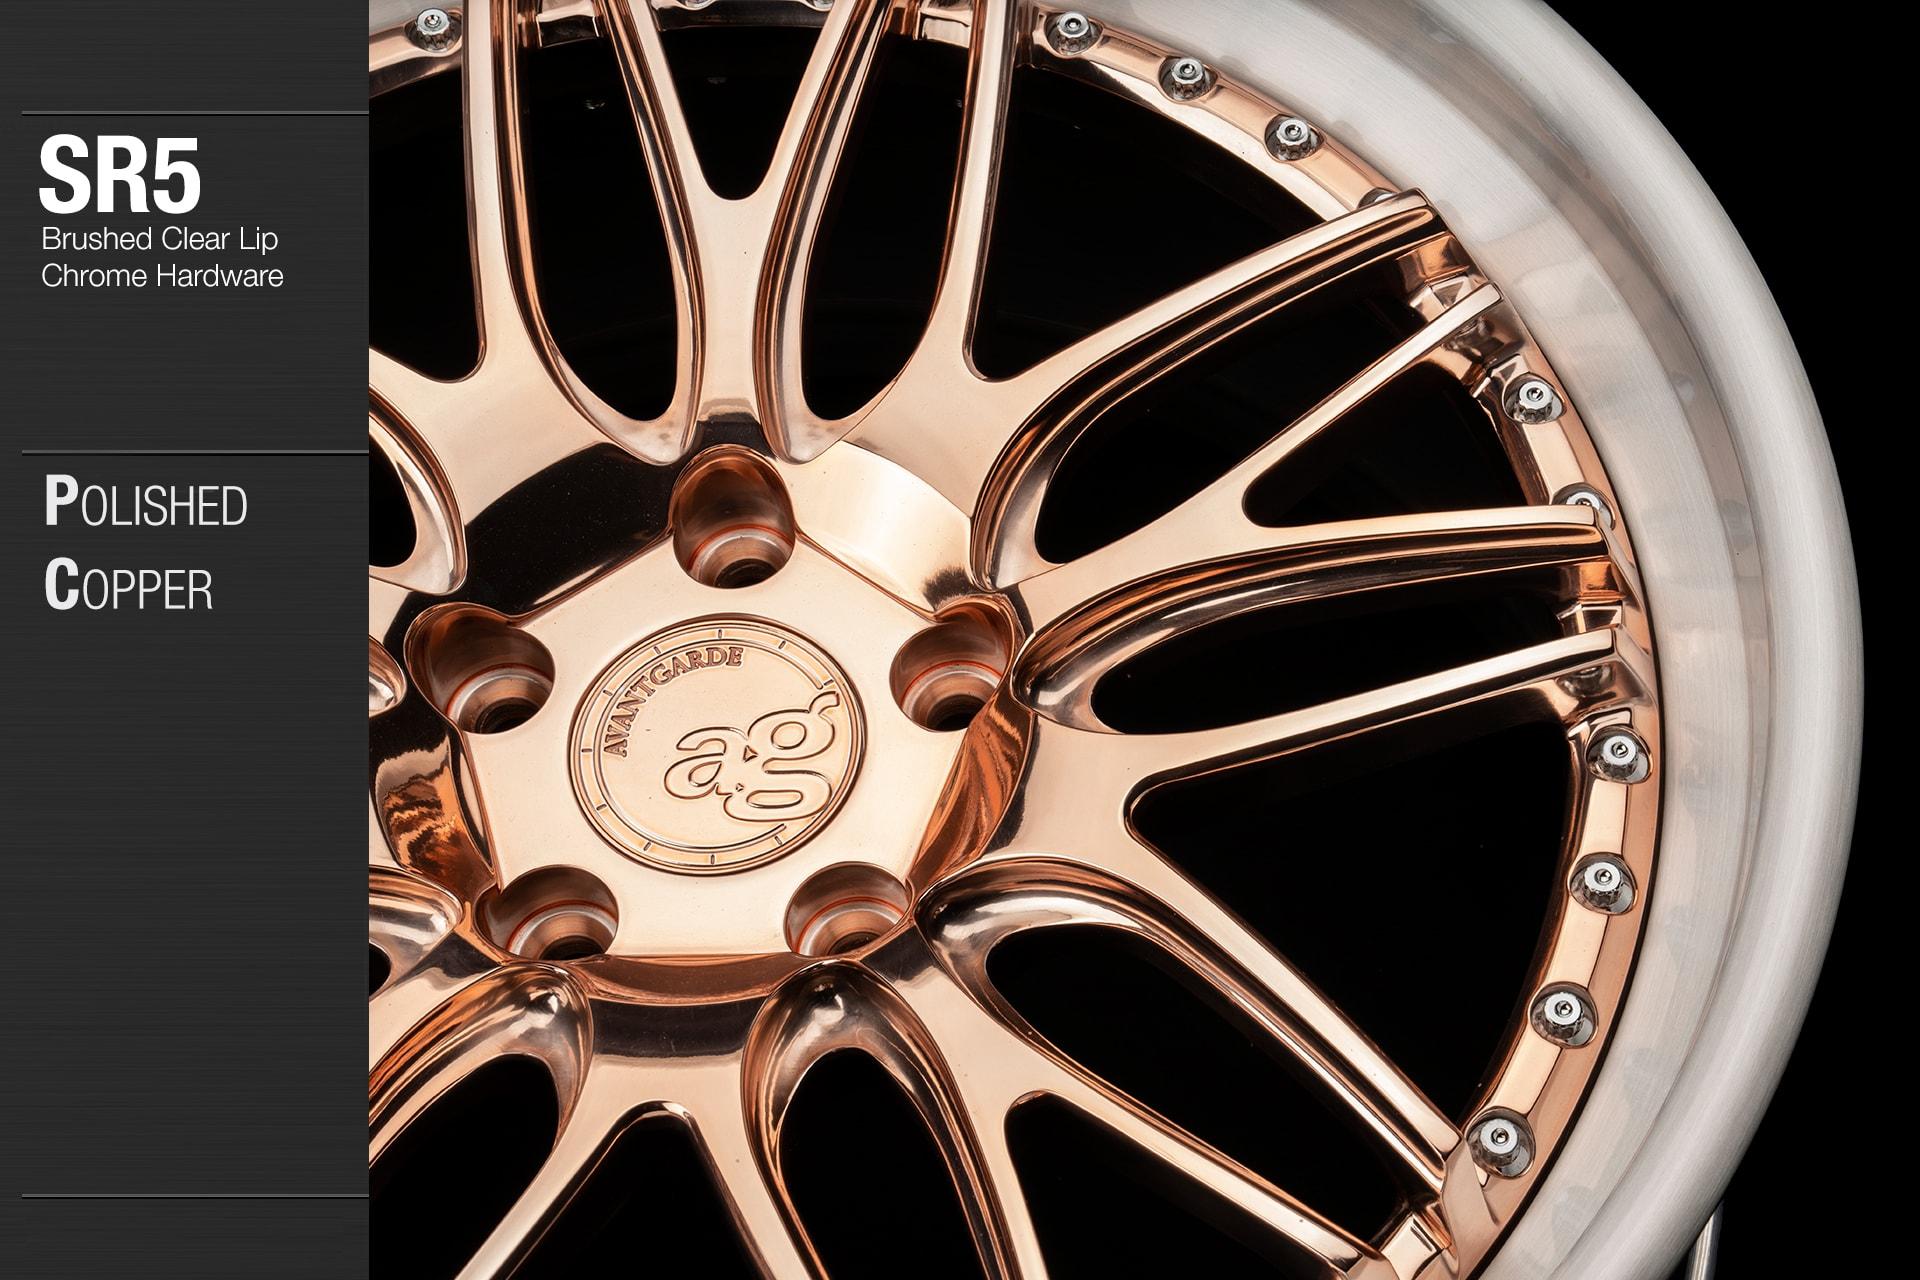 avant-garde-ag-wheels-sr5-polished-copper-face-brushed-clear-lip-chrome-hardware-2